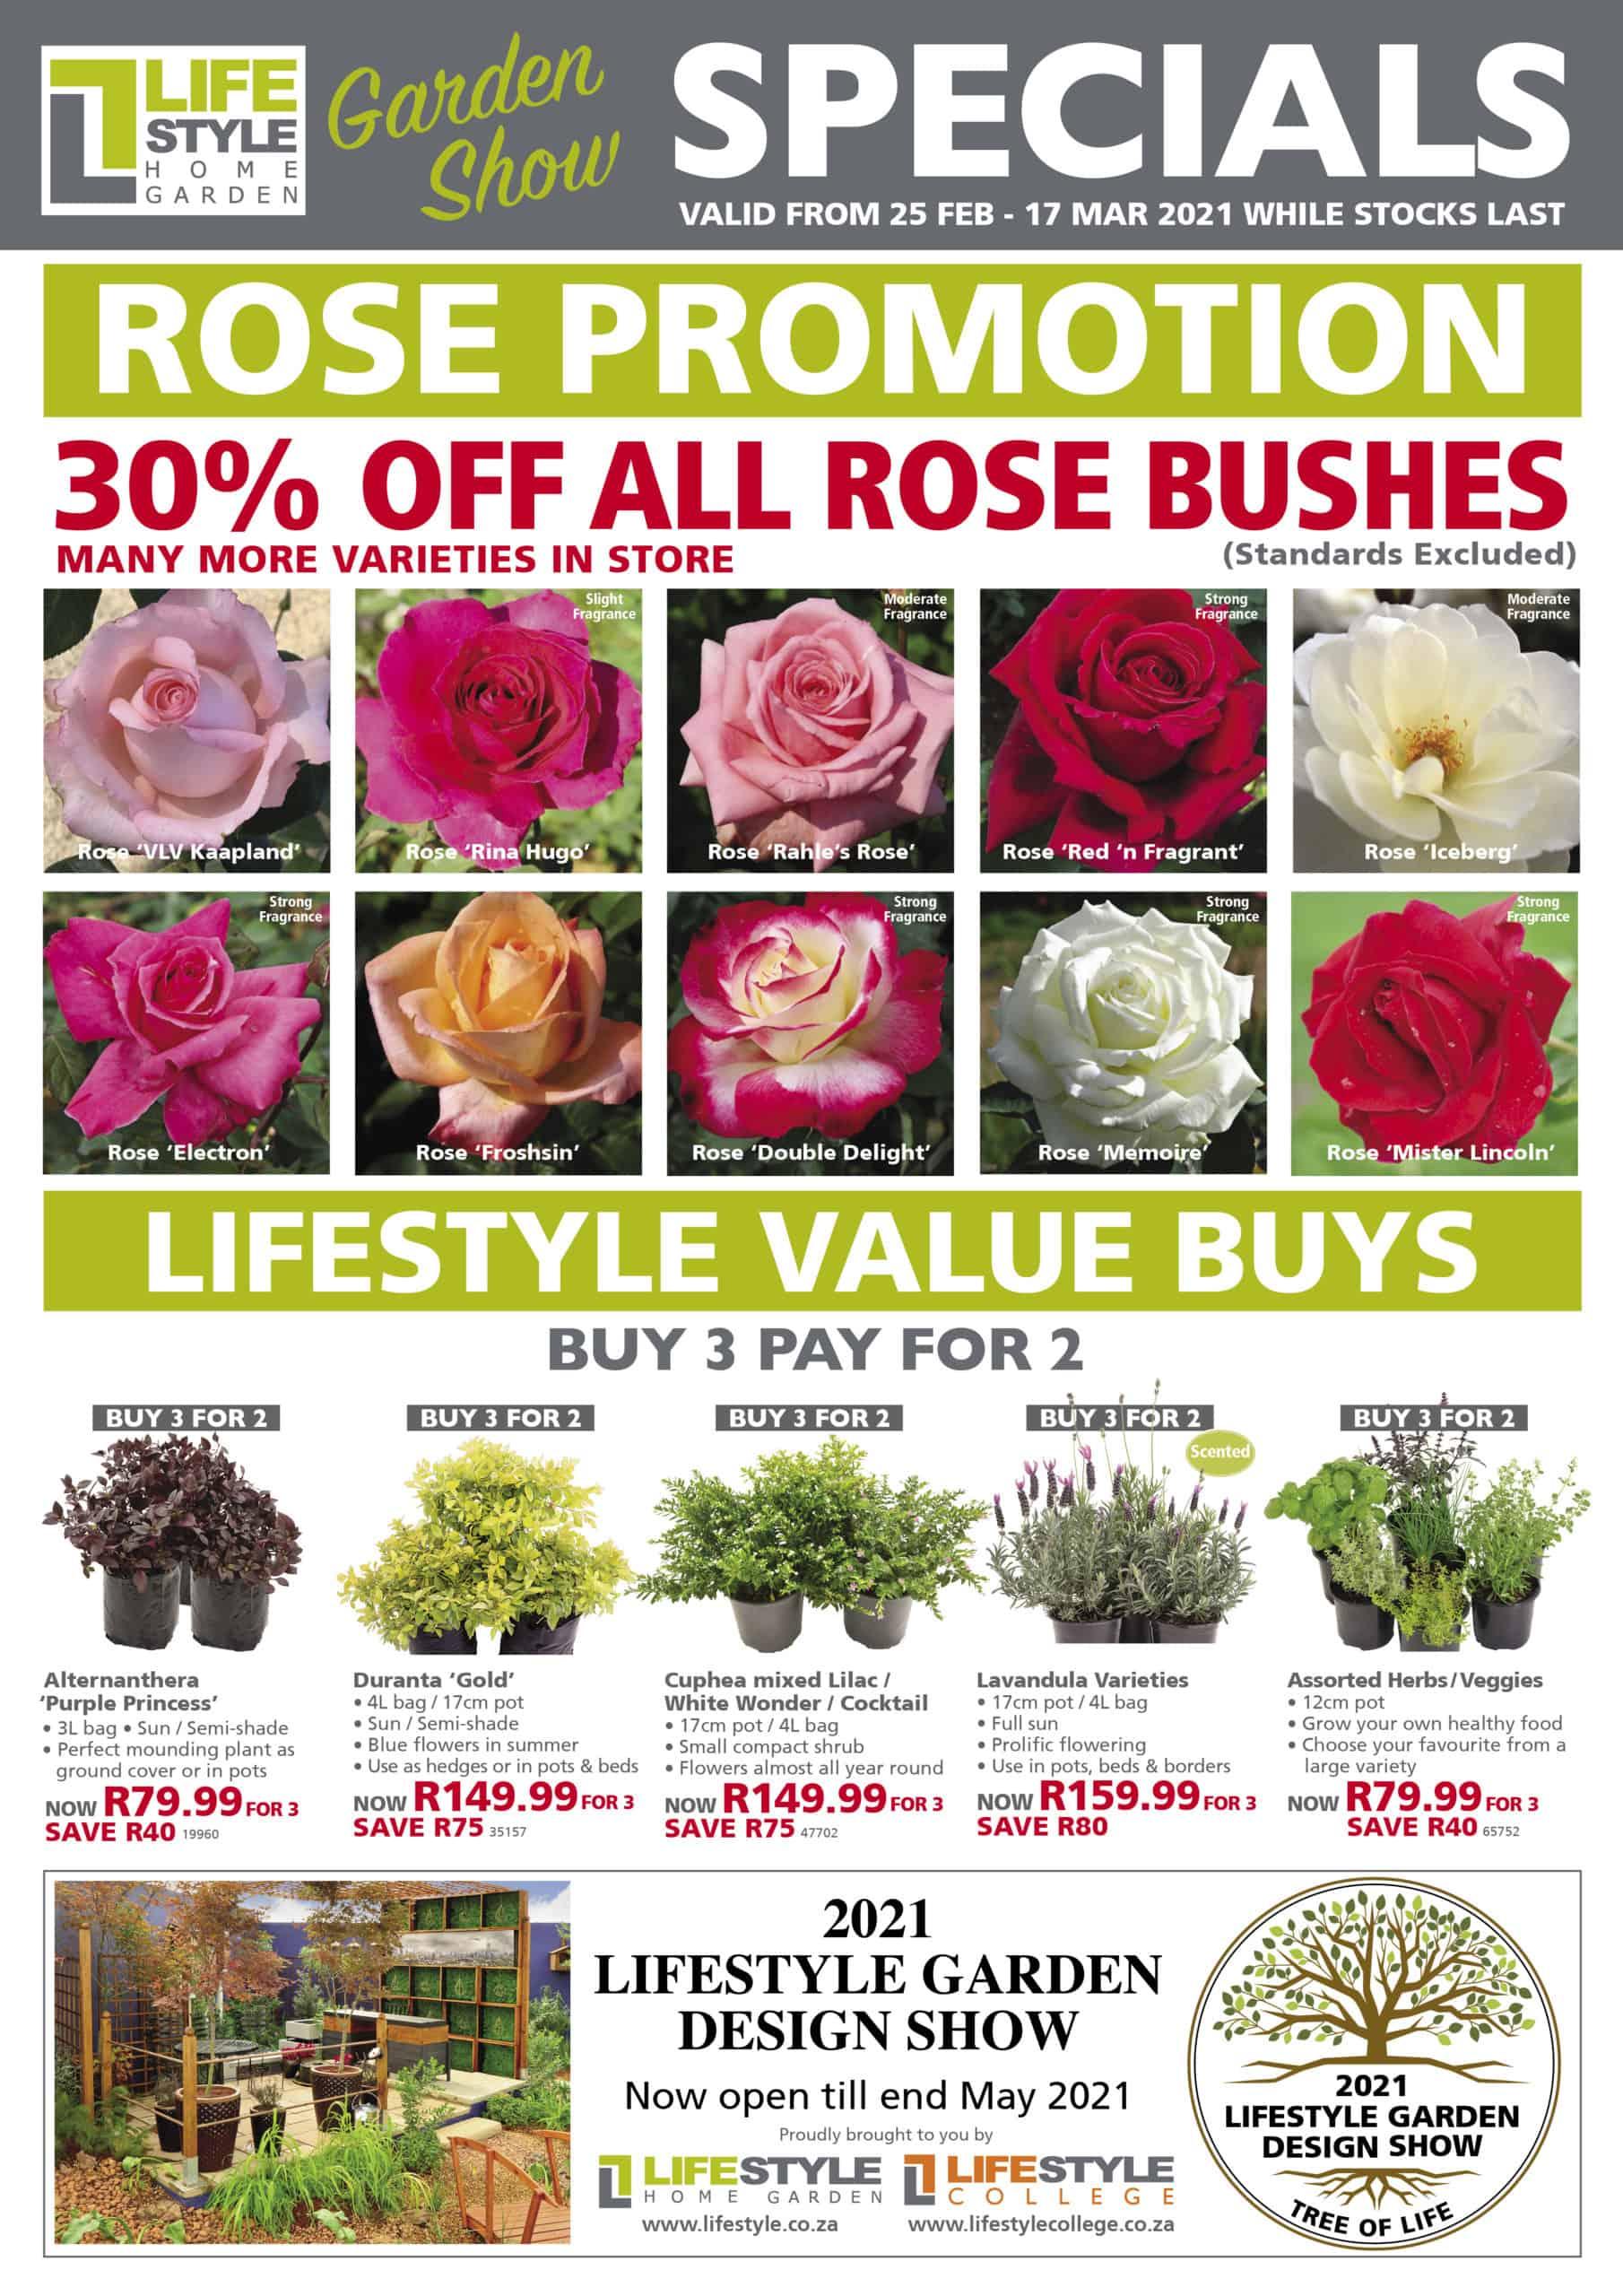 lifestyle home garden leaflet specials autumn nursery plant shop seasonal plants gardening johannesburg gauteng roses rose value promotions